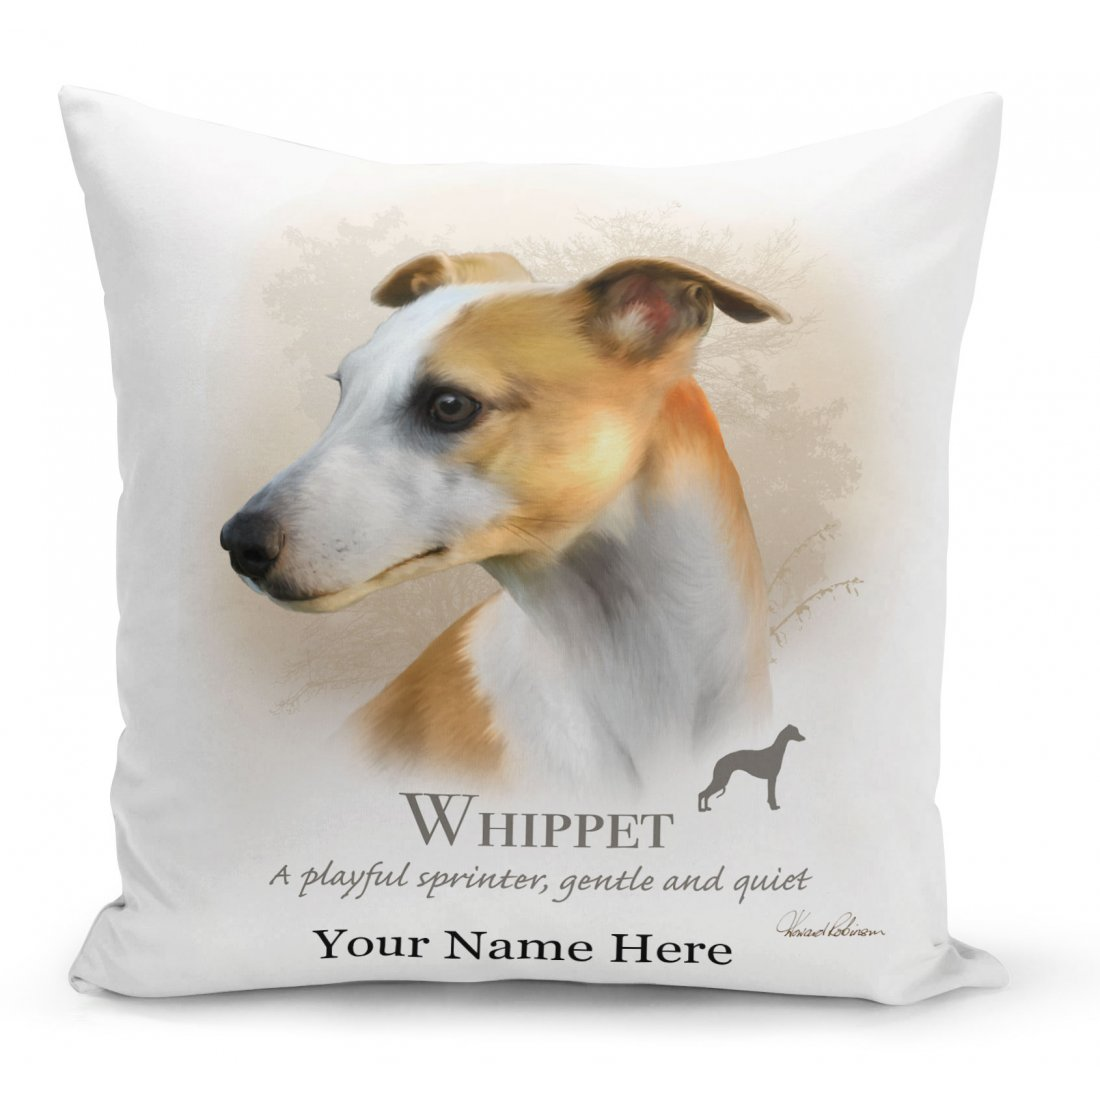 Whippet Dog Cushion